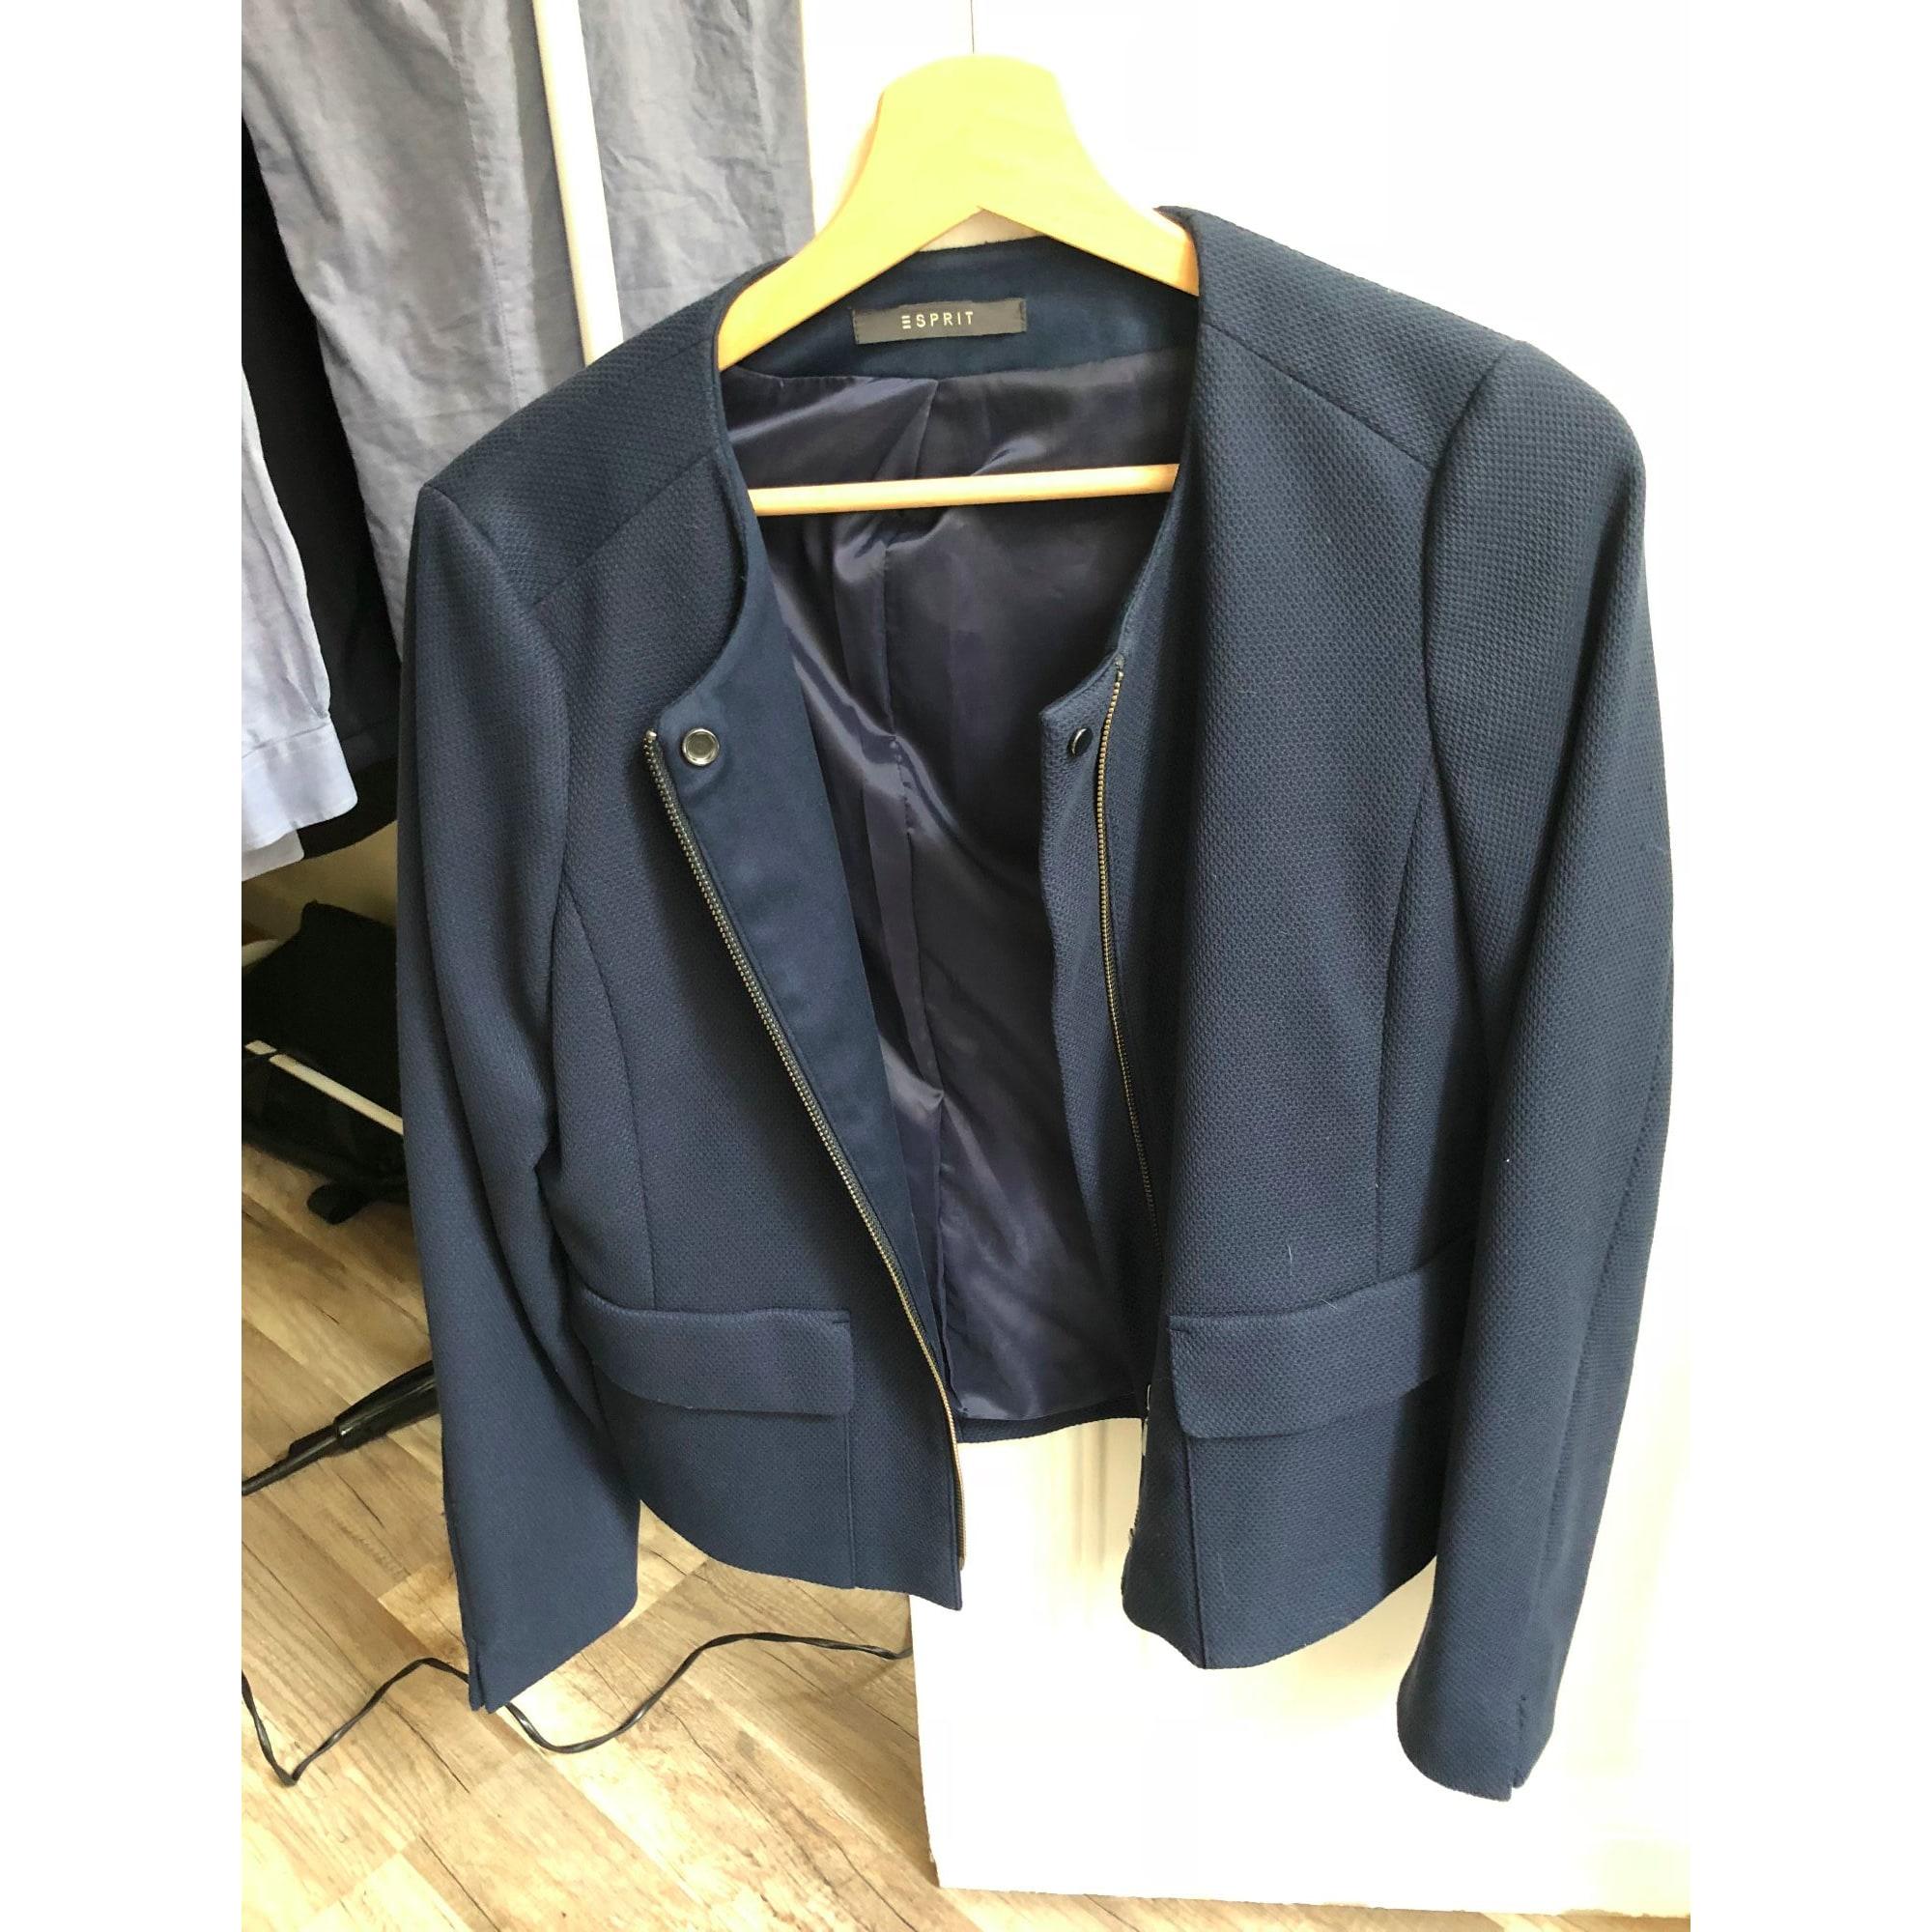 Veste femme Bleu Marine, esprit tailleur